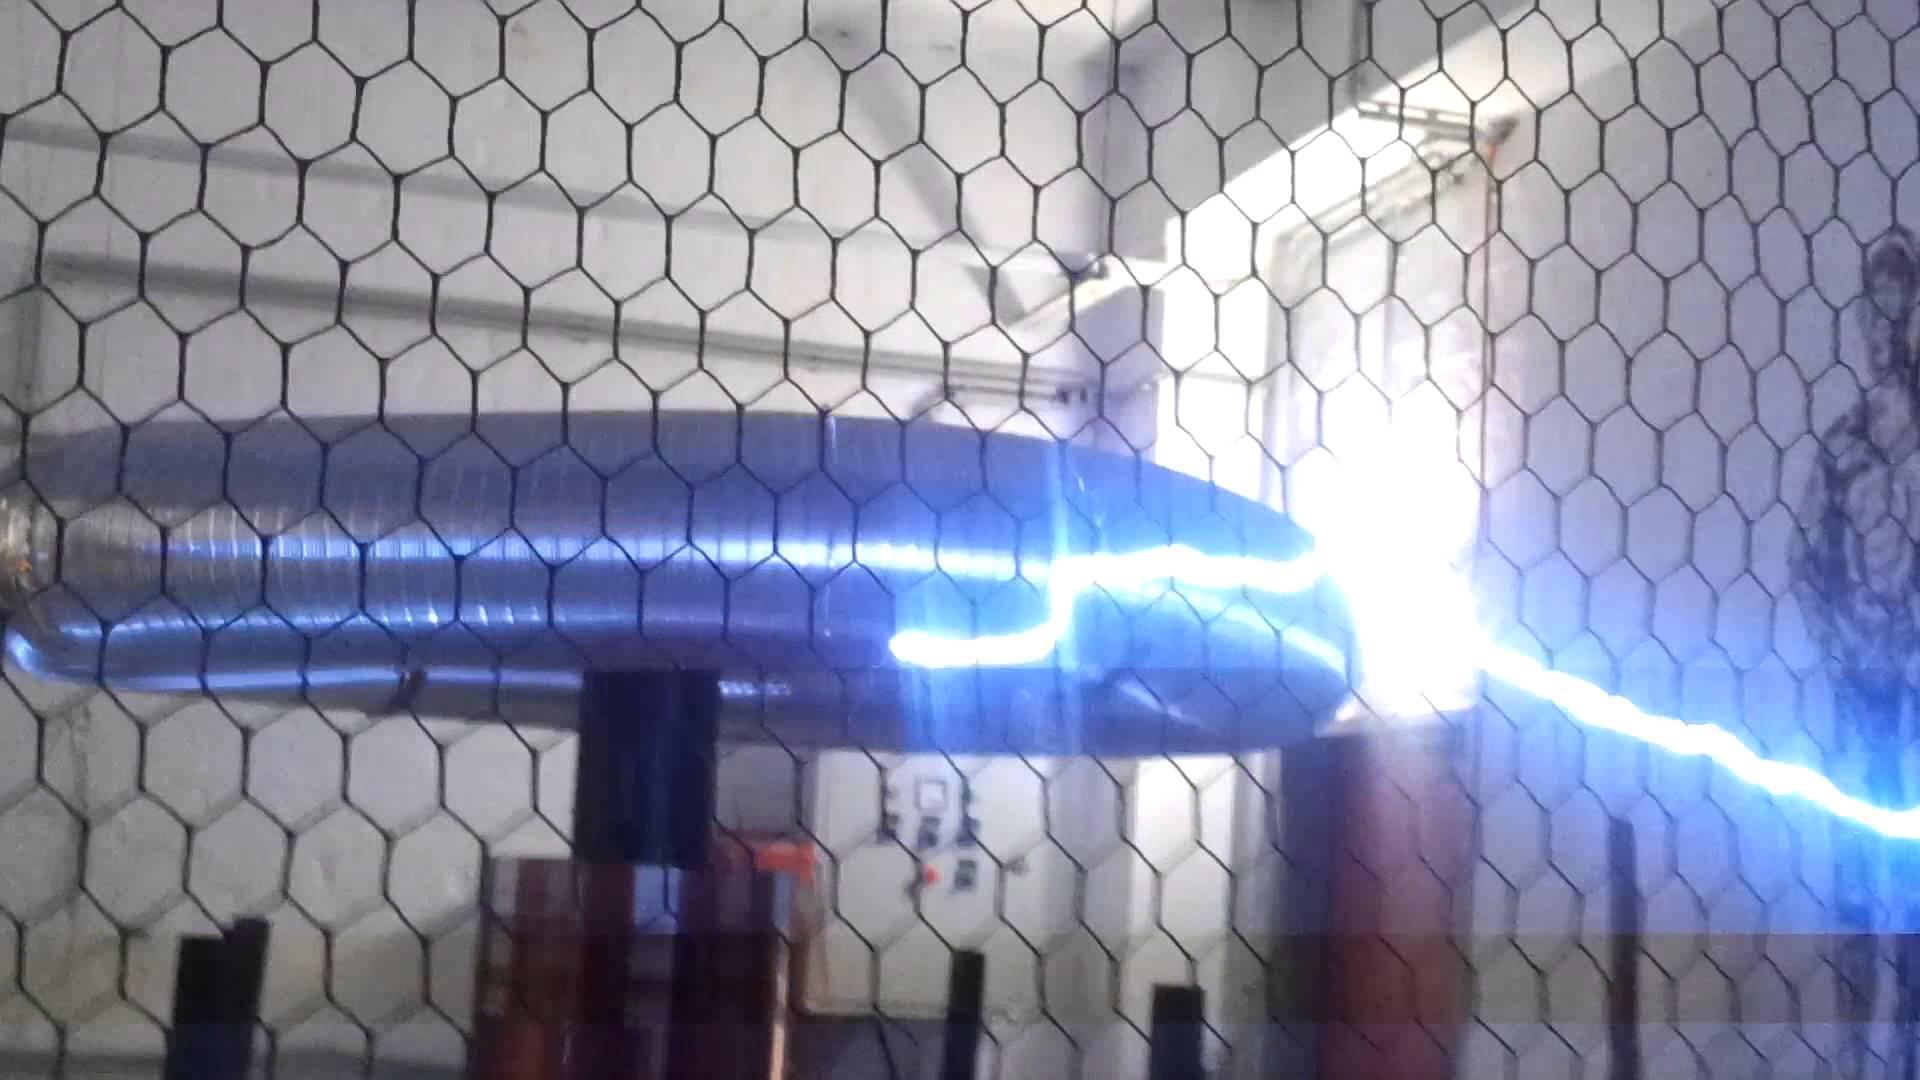 Faraday'scher Käfig 2.